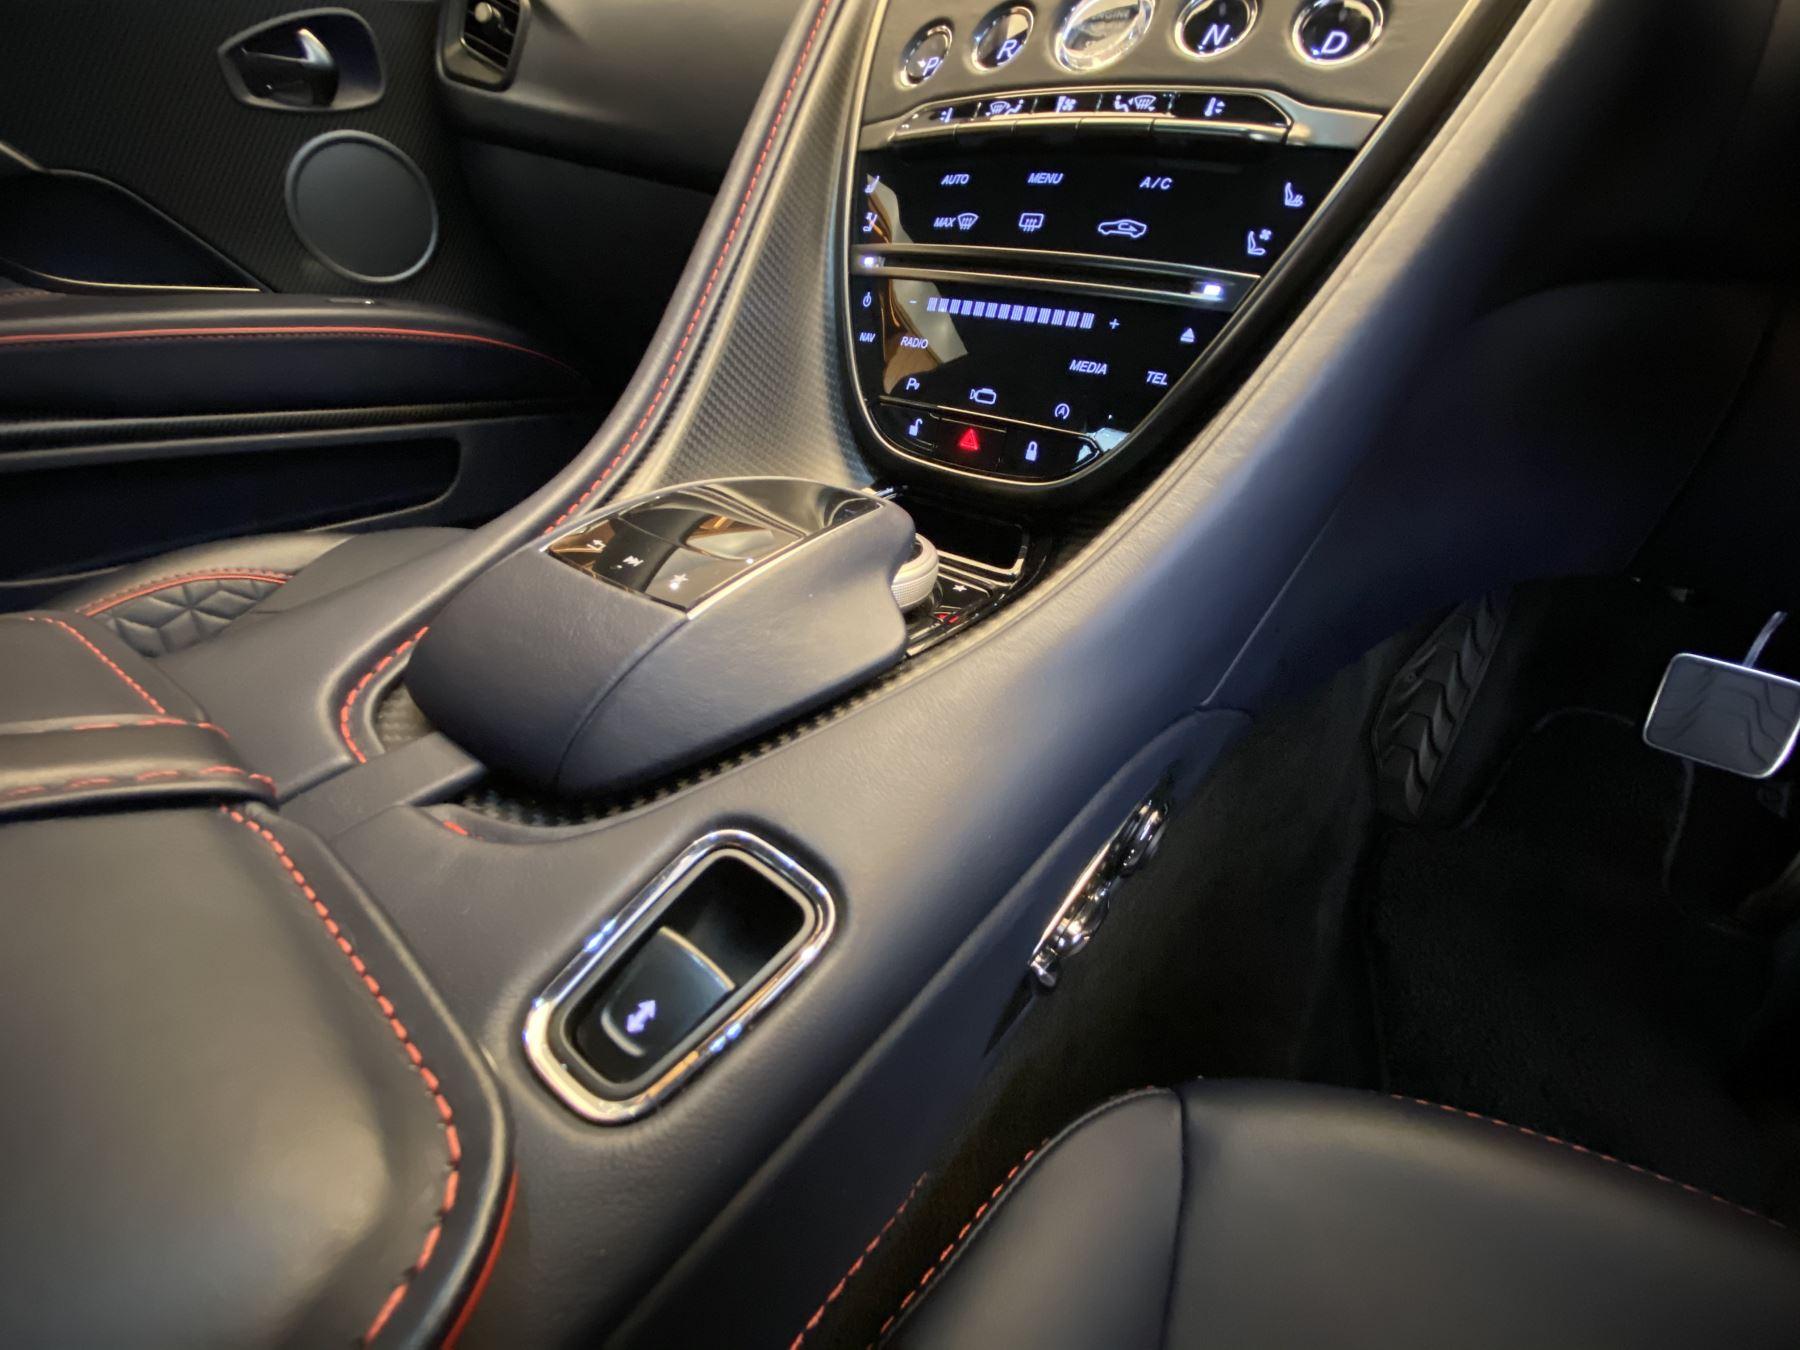 Aston Martin DBS V12 Superleggera 2dr Touchtronic image 23